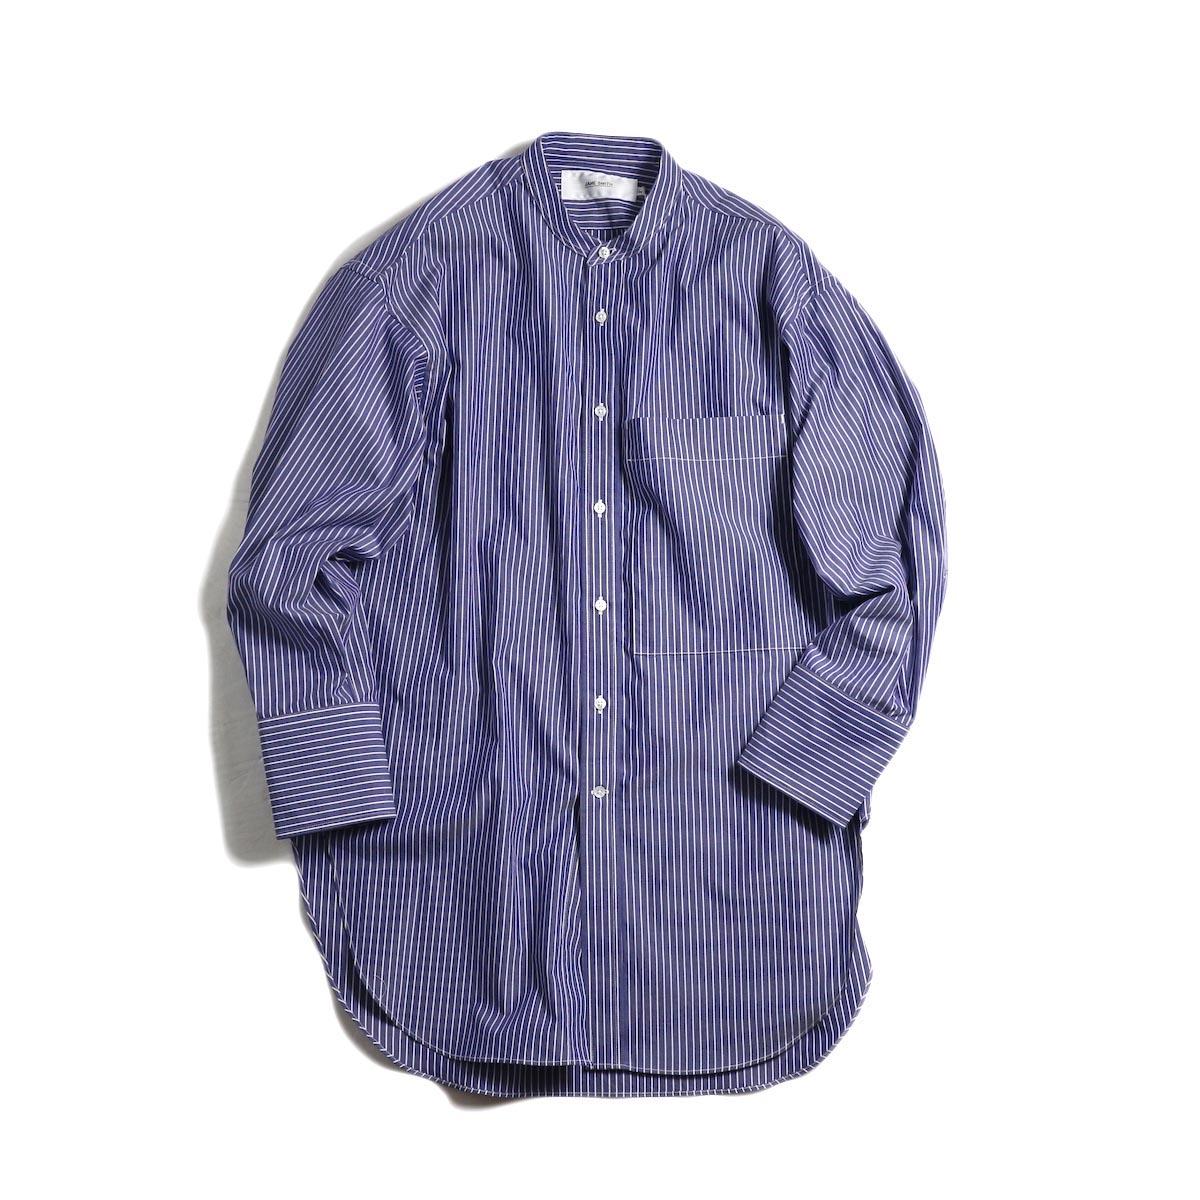 JANE SMITH / 1990s Banded Collar Shirts Stripe -Blue Stripe